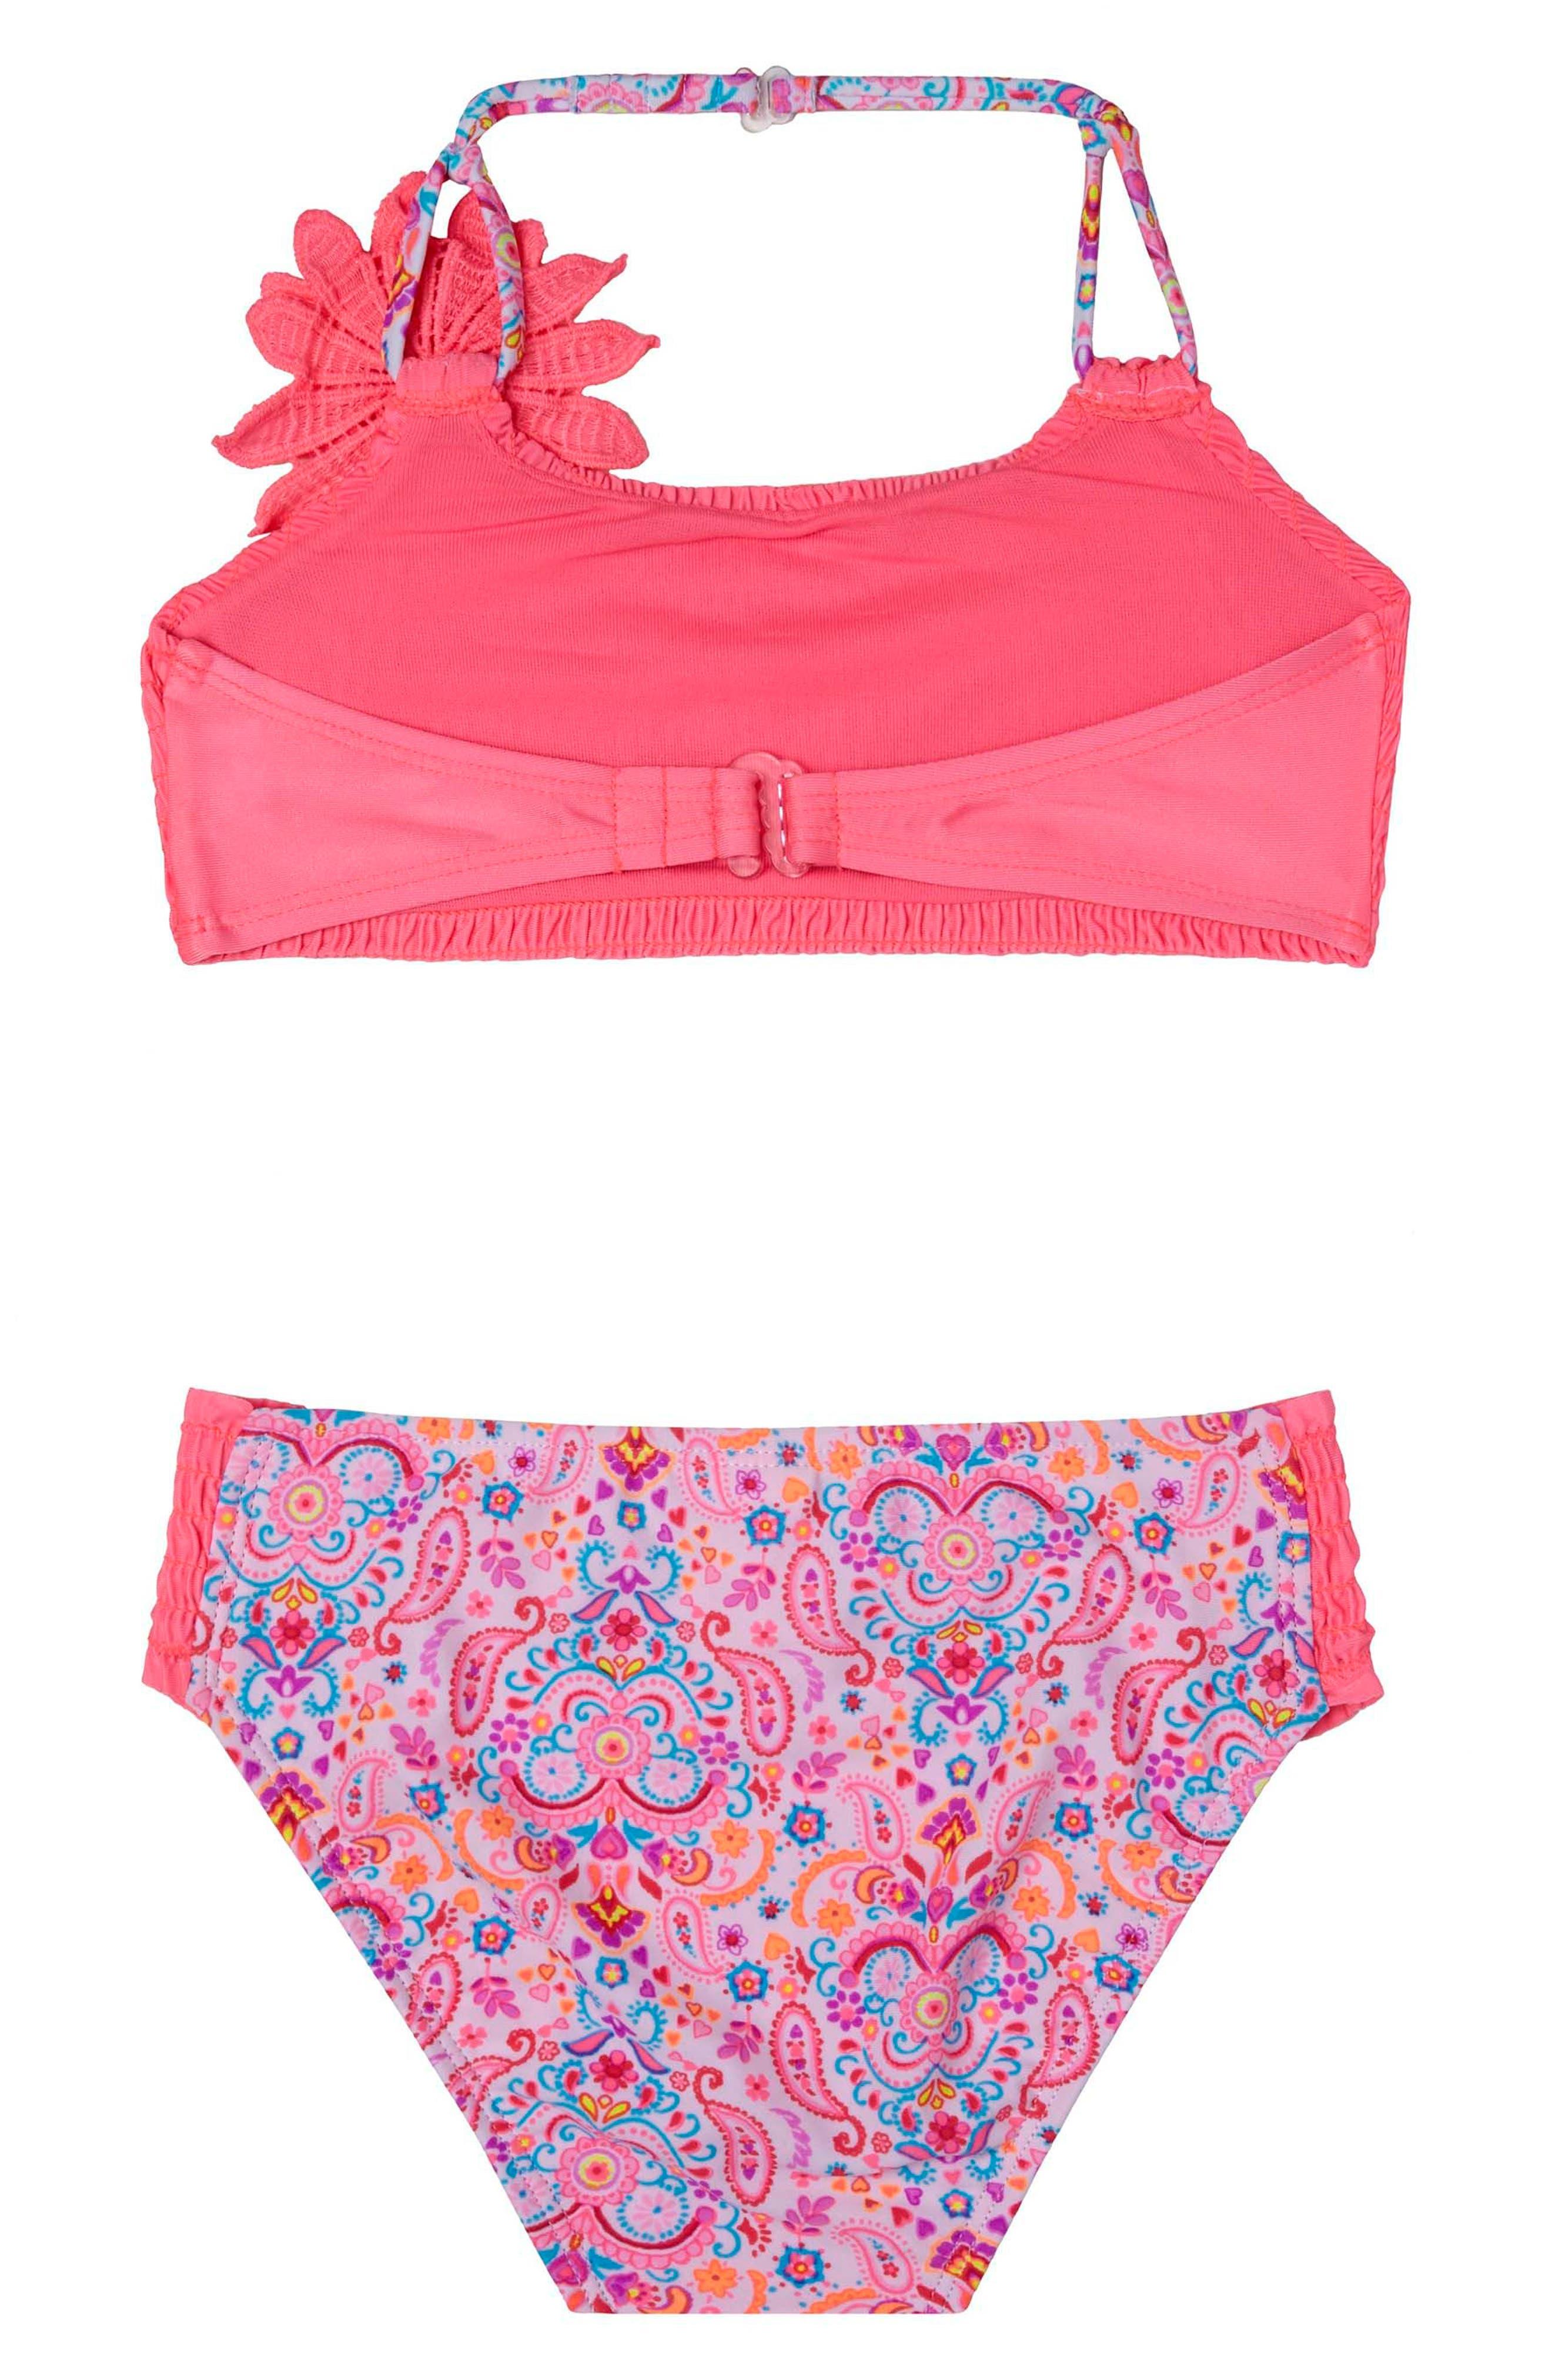 Pretty PaisleyTwo-Piece Swimsuit,                             Main thumbnail 1, color,                             650